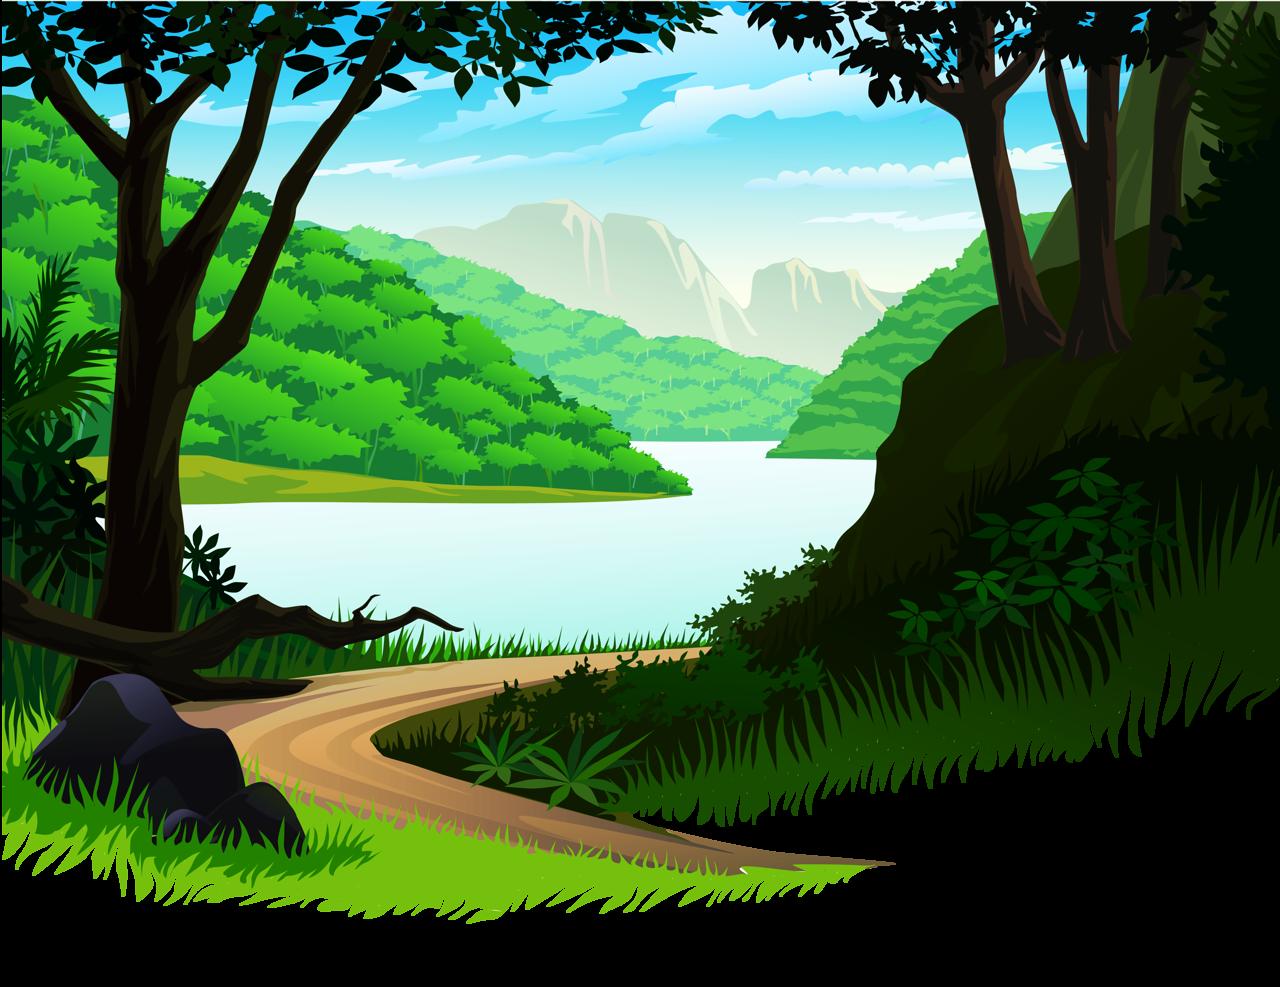 Jungle clipart jungle landscape. Pin by haswan sutanto